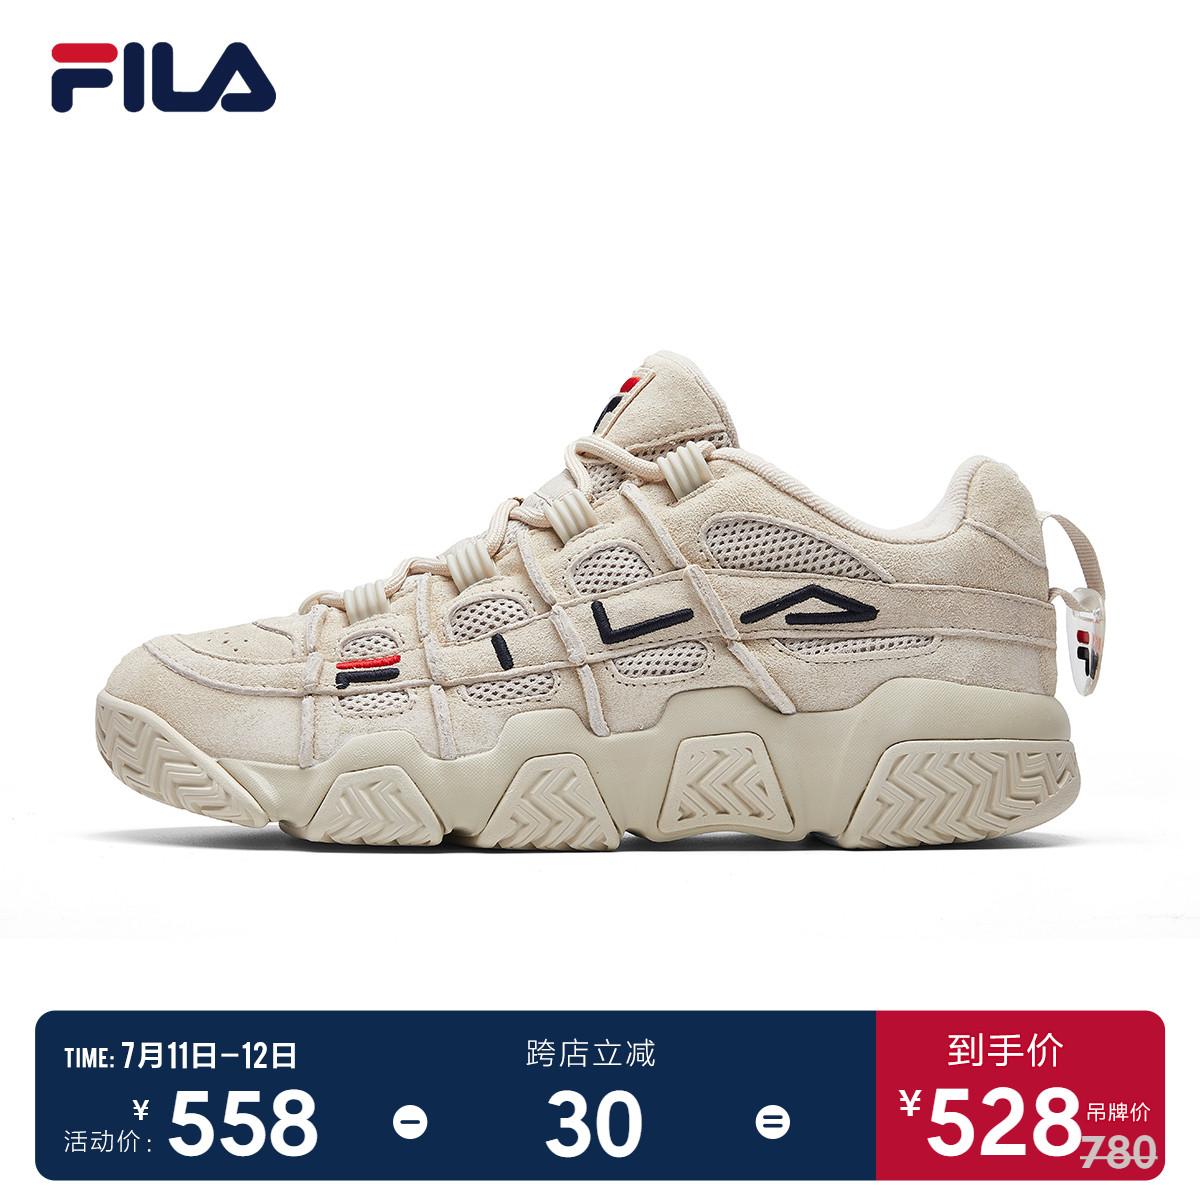 FILA 斐乐官方 篮球鞋女2020夏秋休闲鞋复古运动鞋低帮球鞋面包鞋